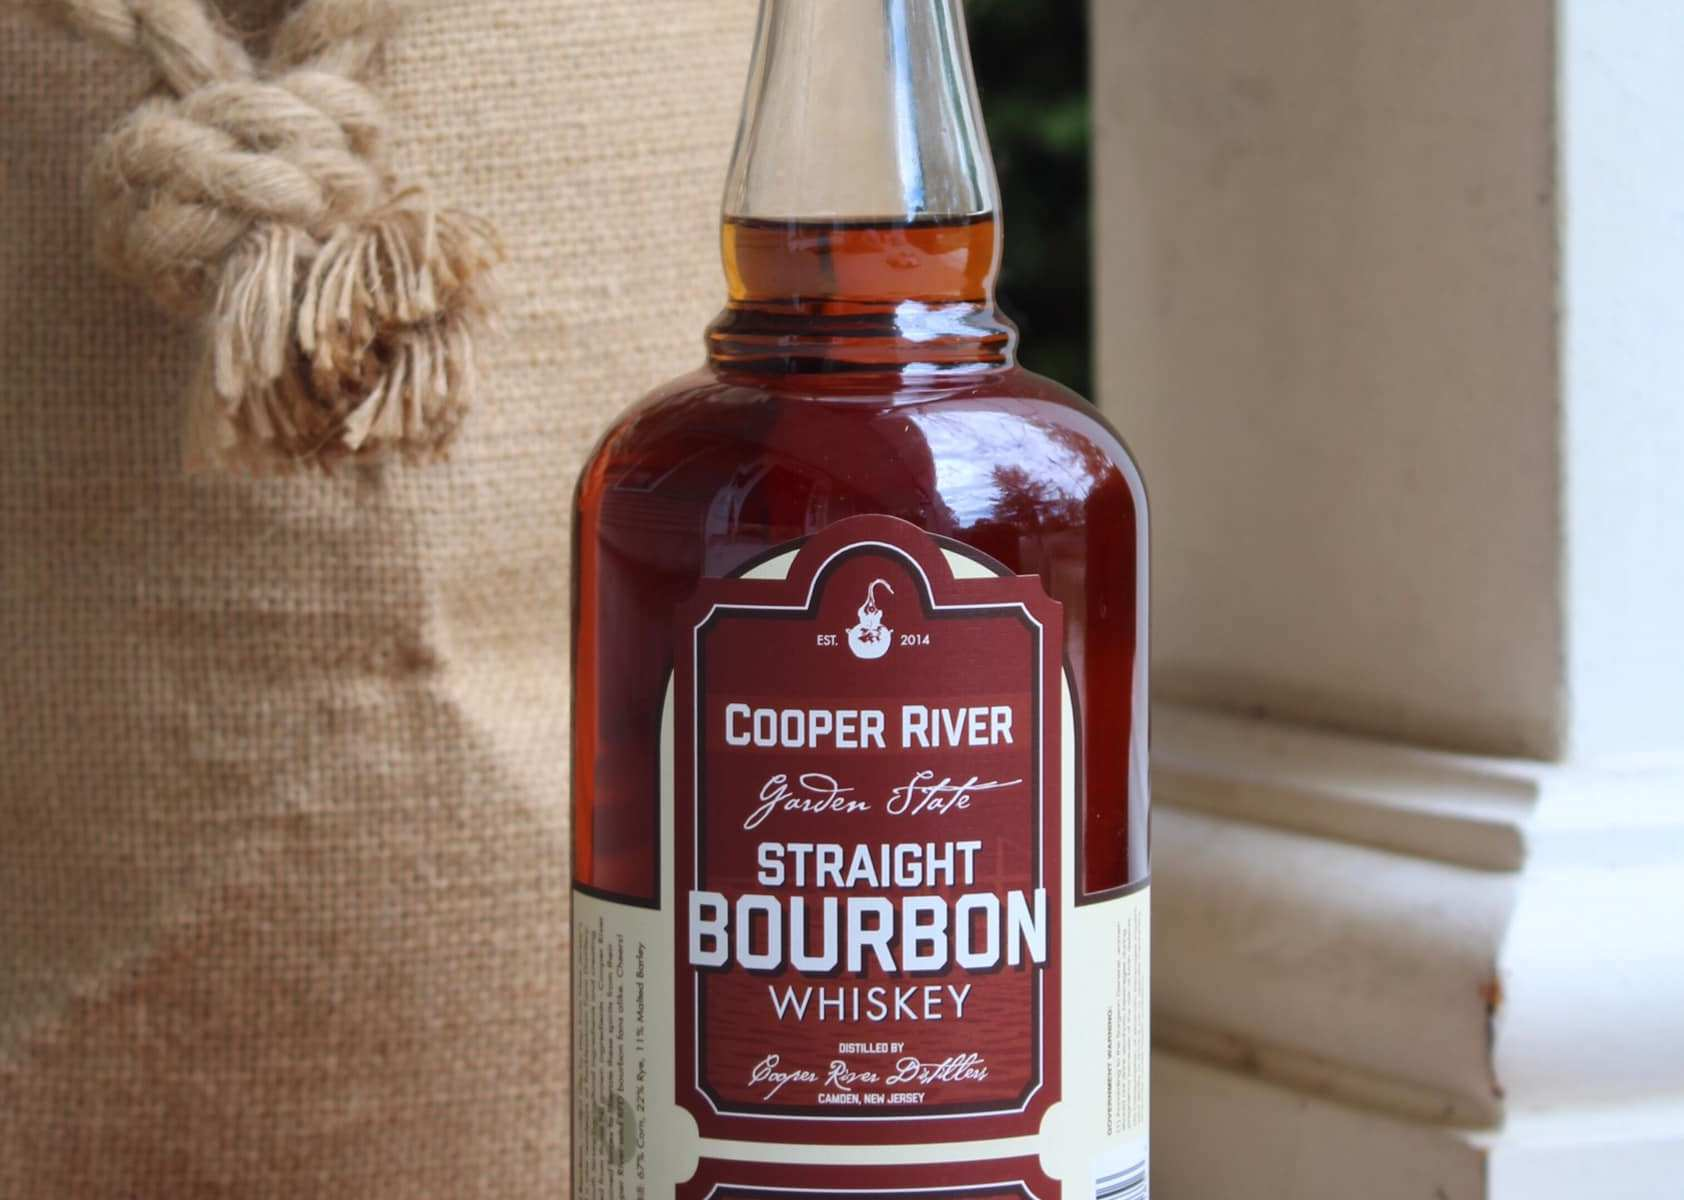 Cooper River Straight Bourbon